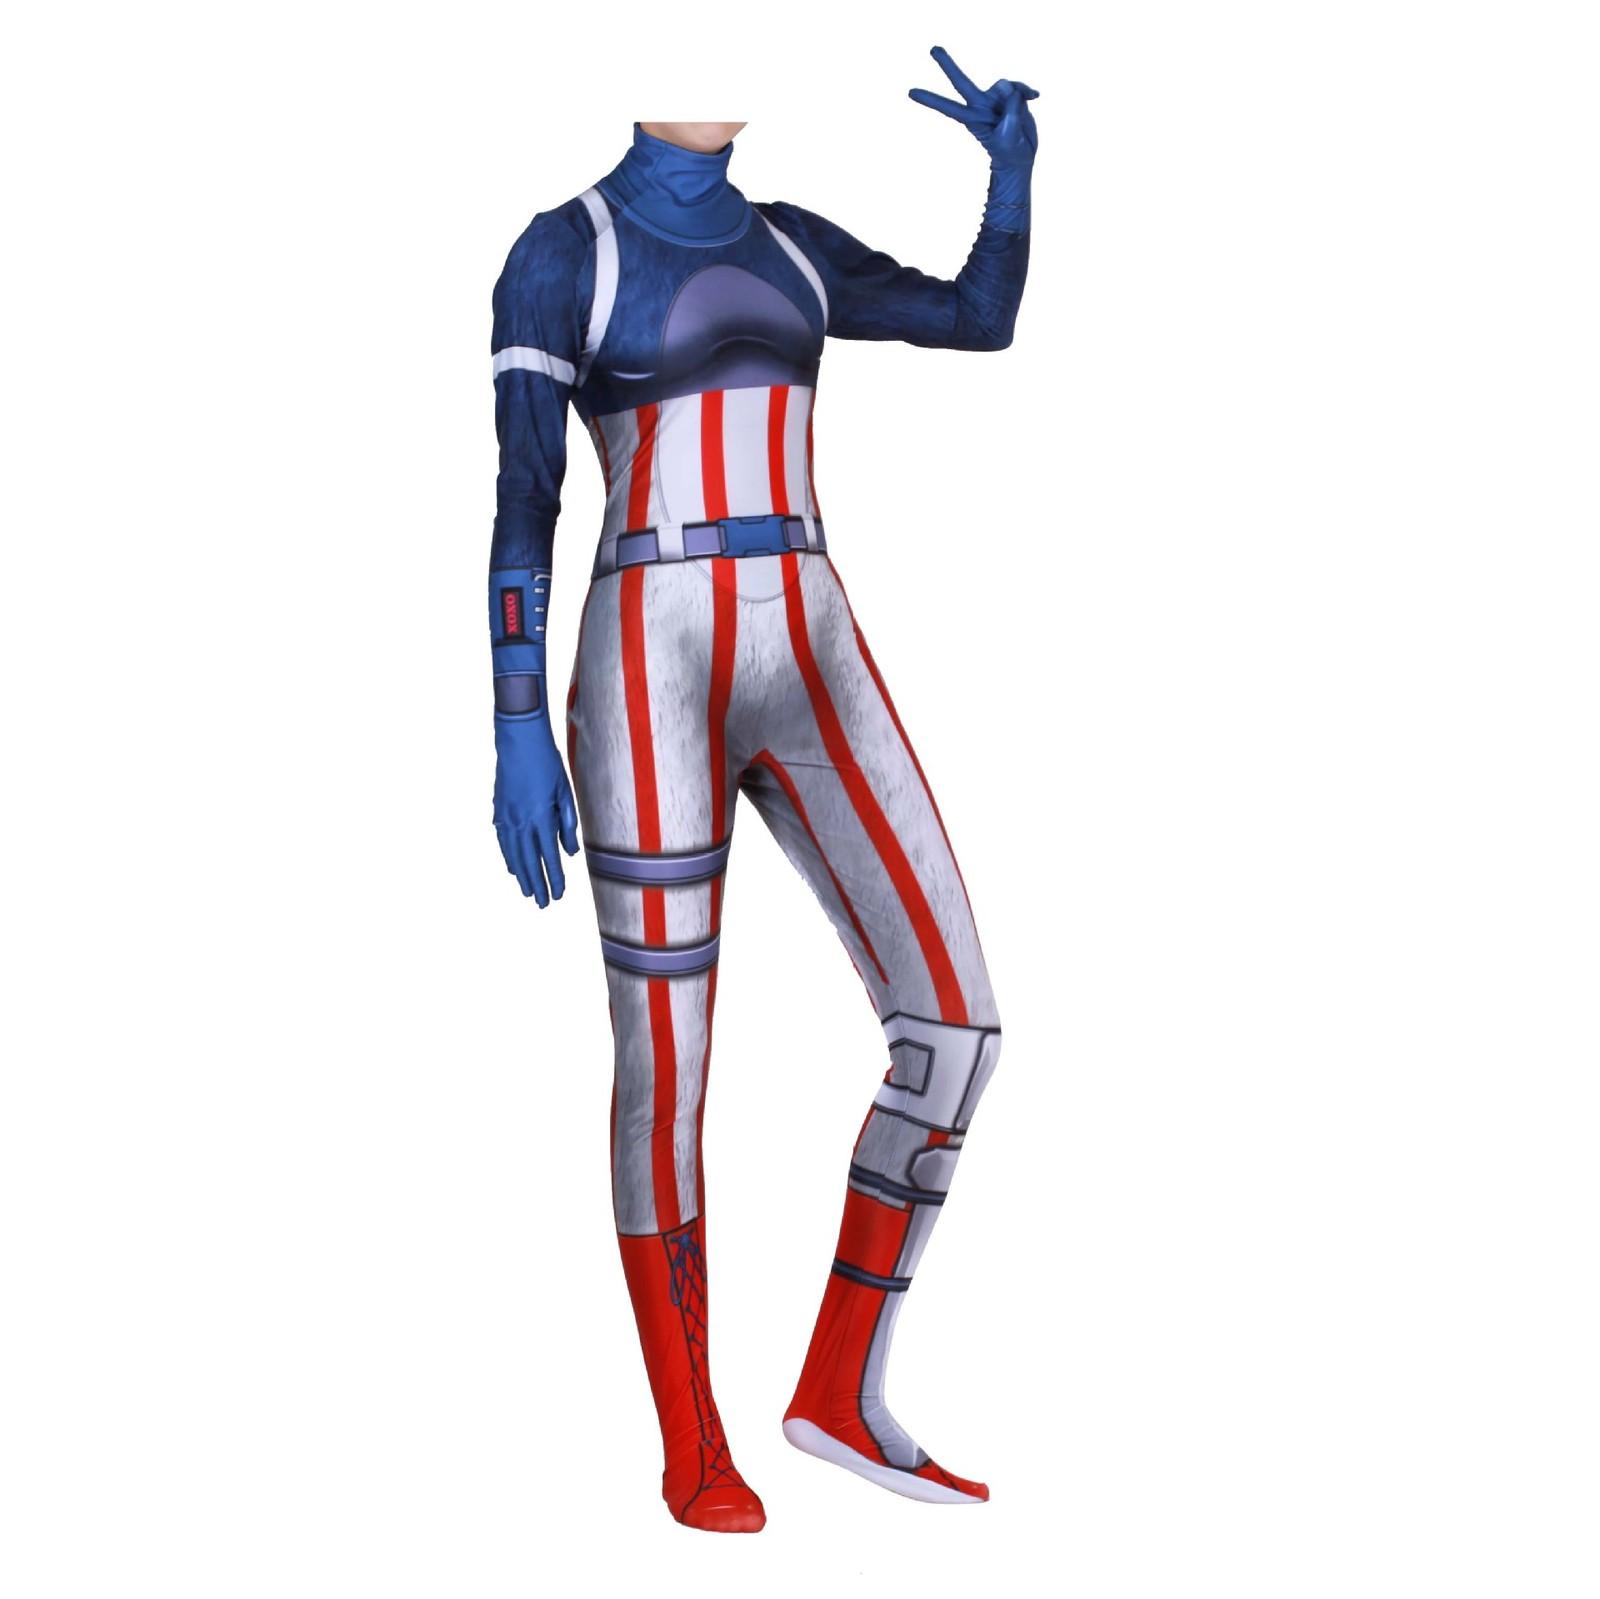 Game fortnite team leader jumpsuit cosplay costume panda tight 3d point suit new unisex - Panda team leader costume ...